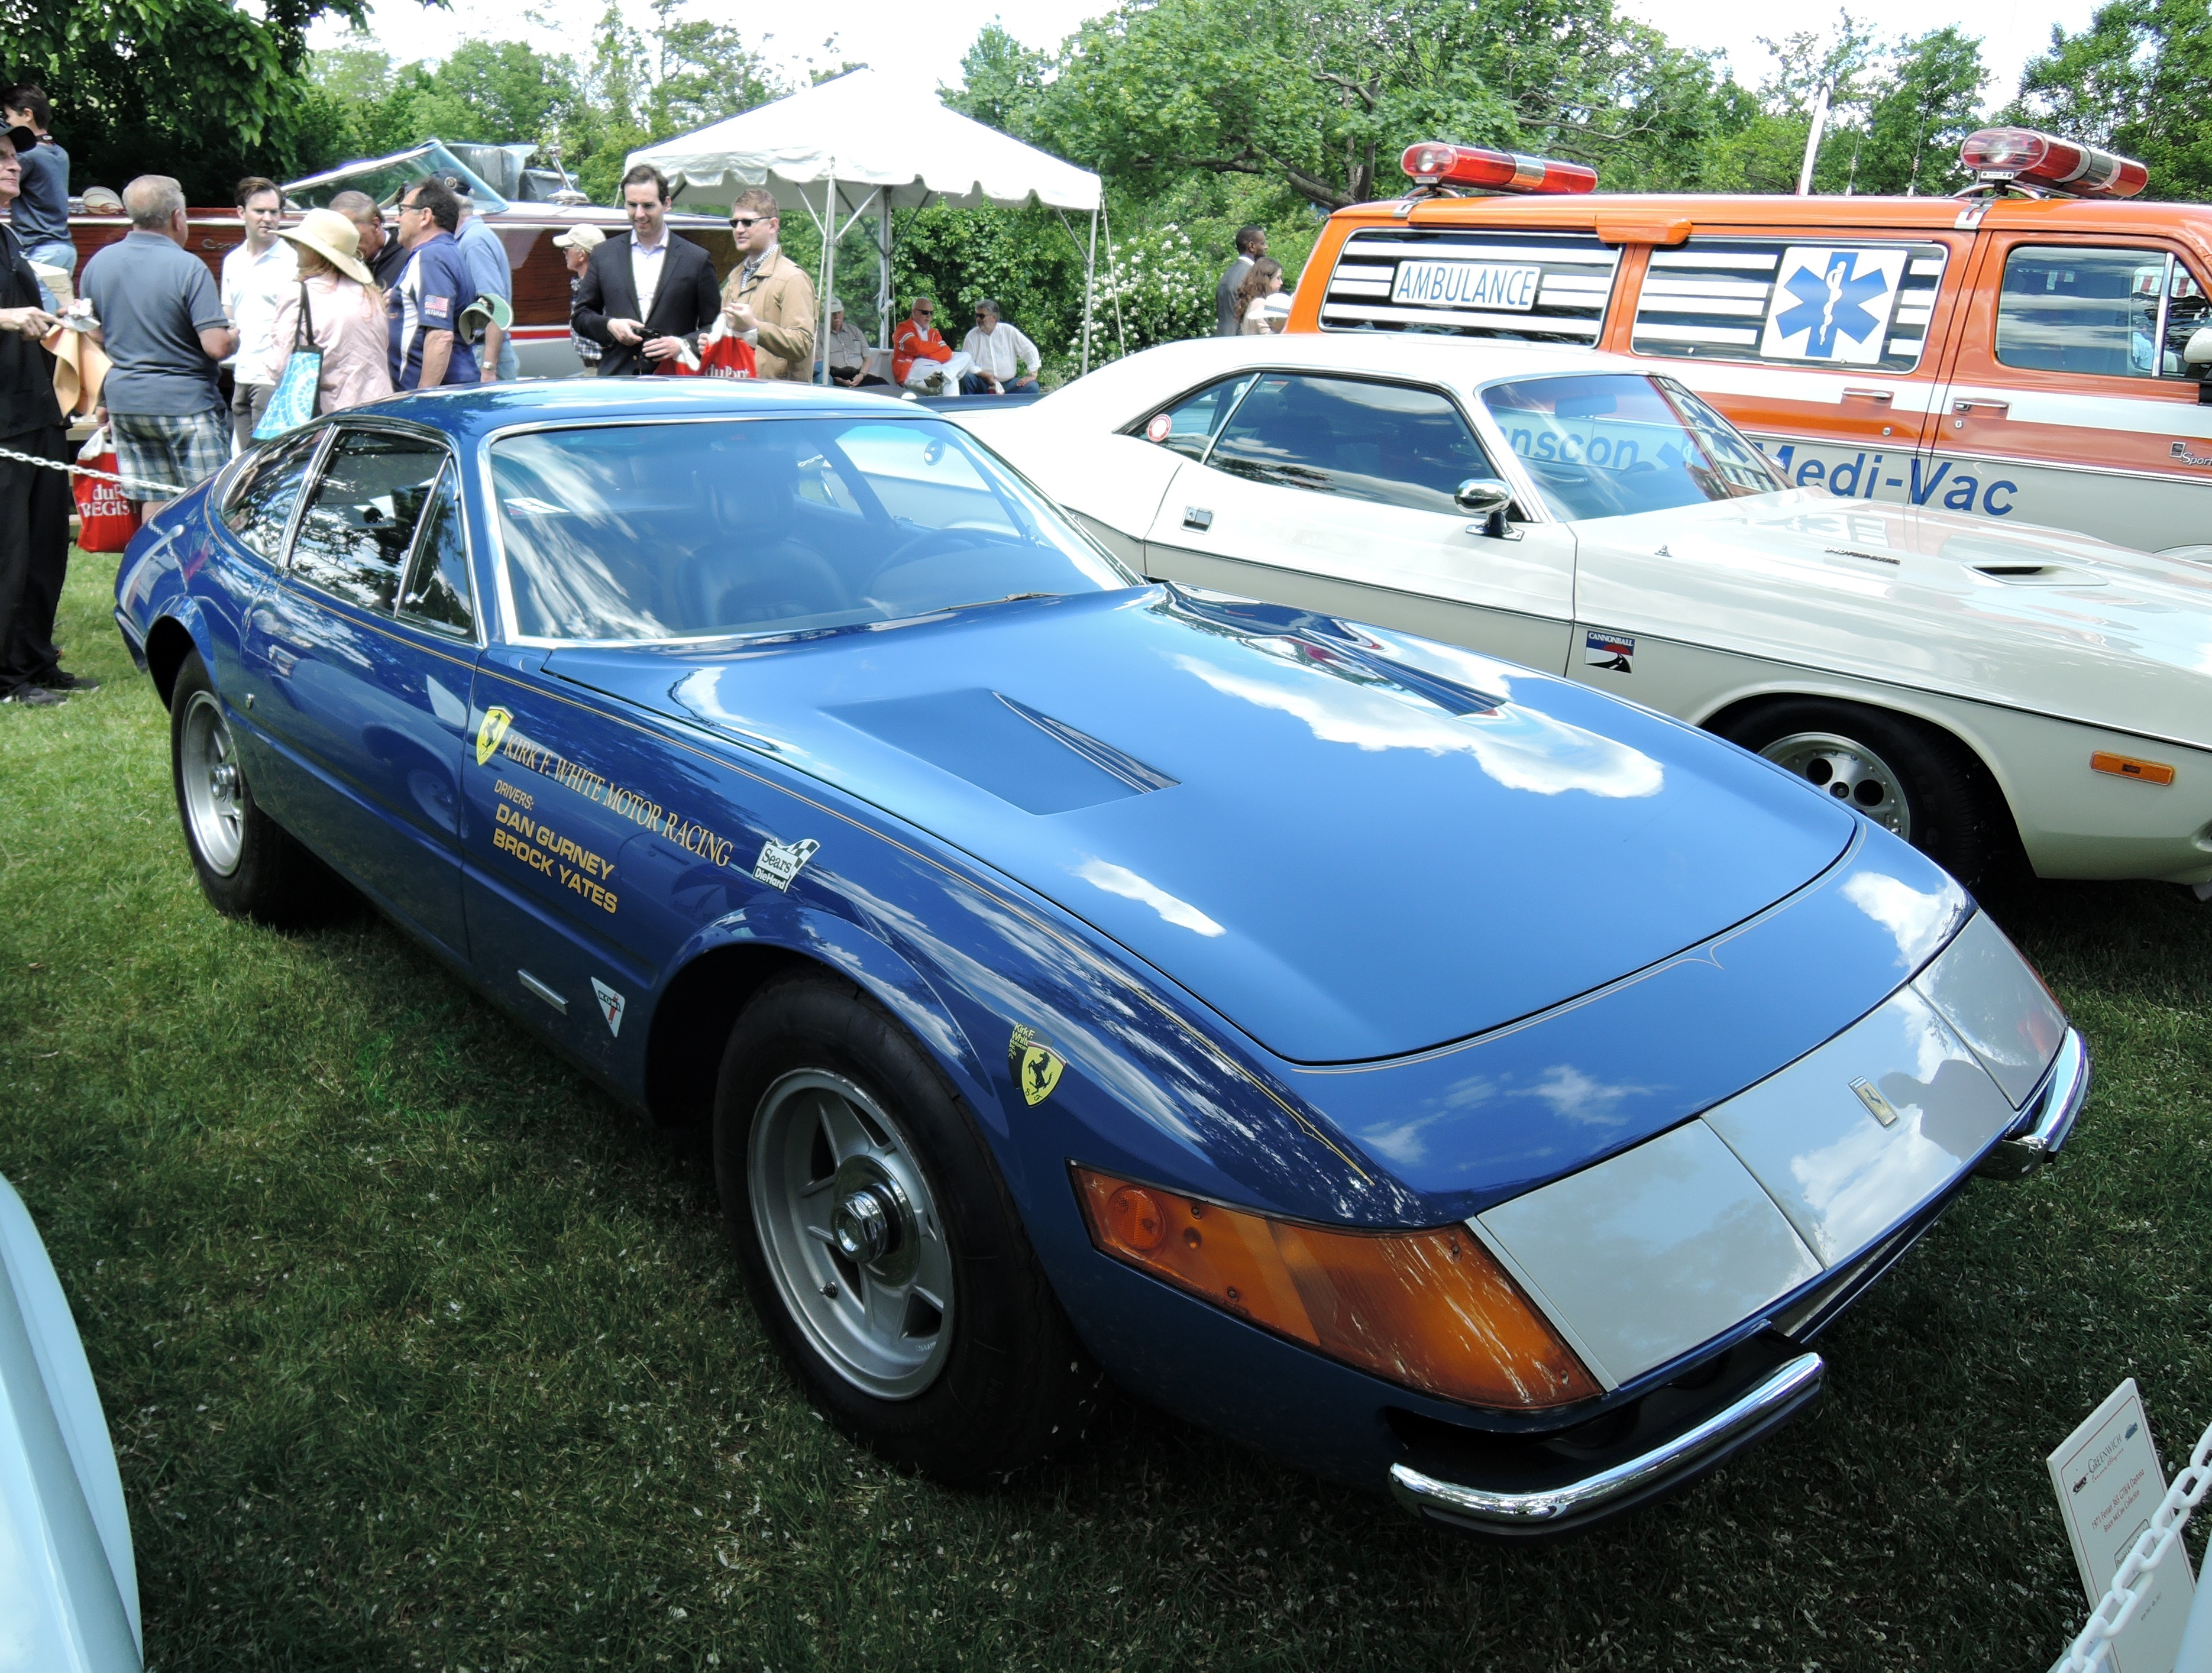 blue Cannonball Run 1971 Ferrari 365 GTB/4 Daytona driven by Dan Gurney and Brock Yates - Greenwich Concours d'Elegance 2017